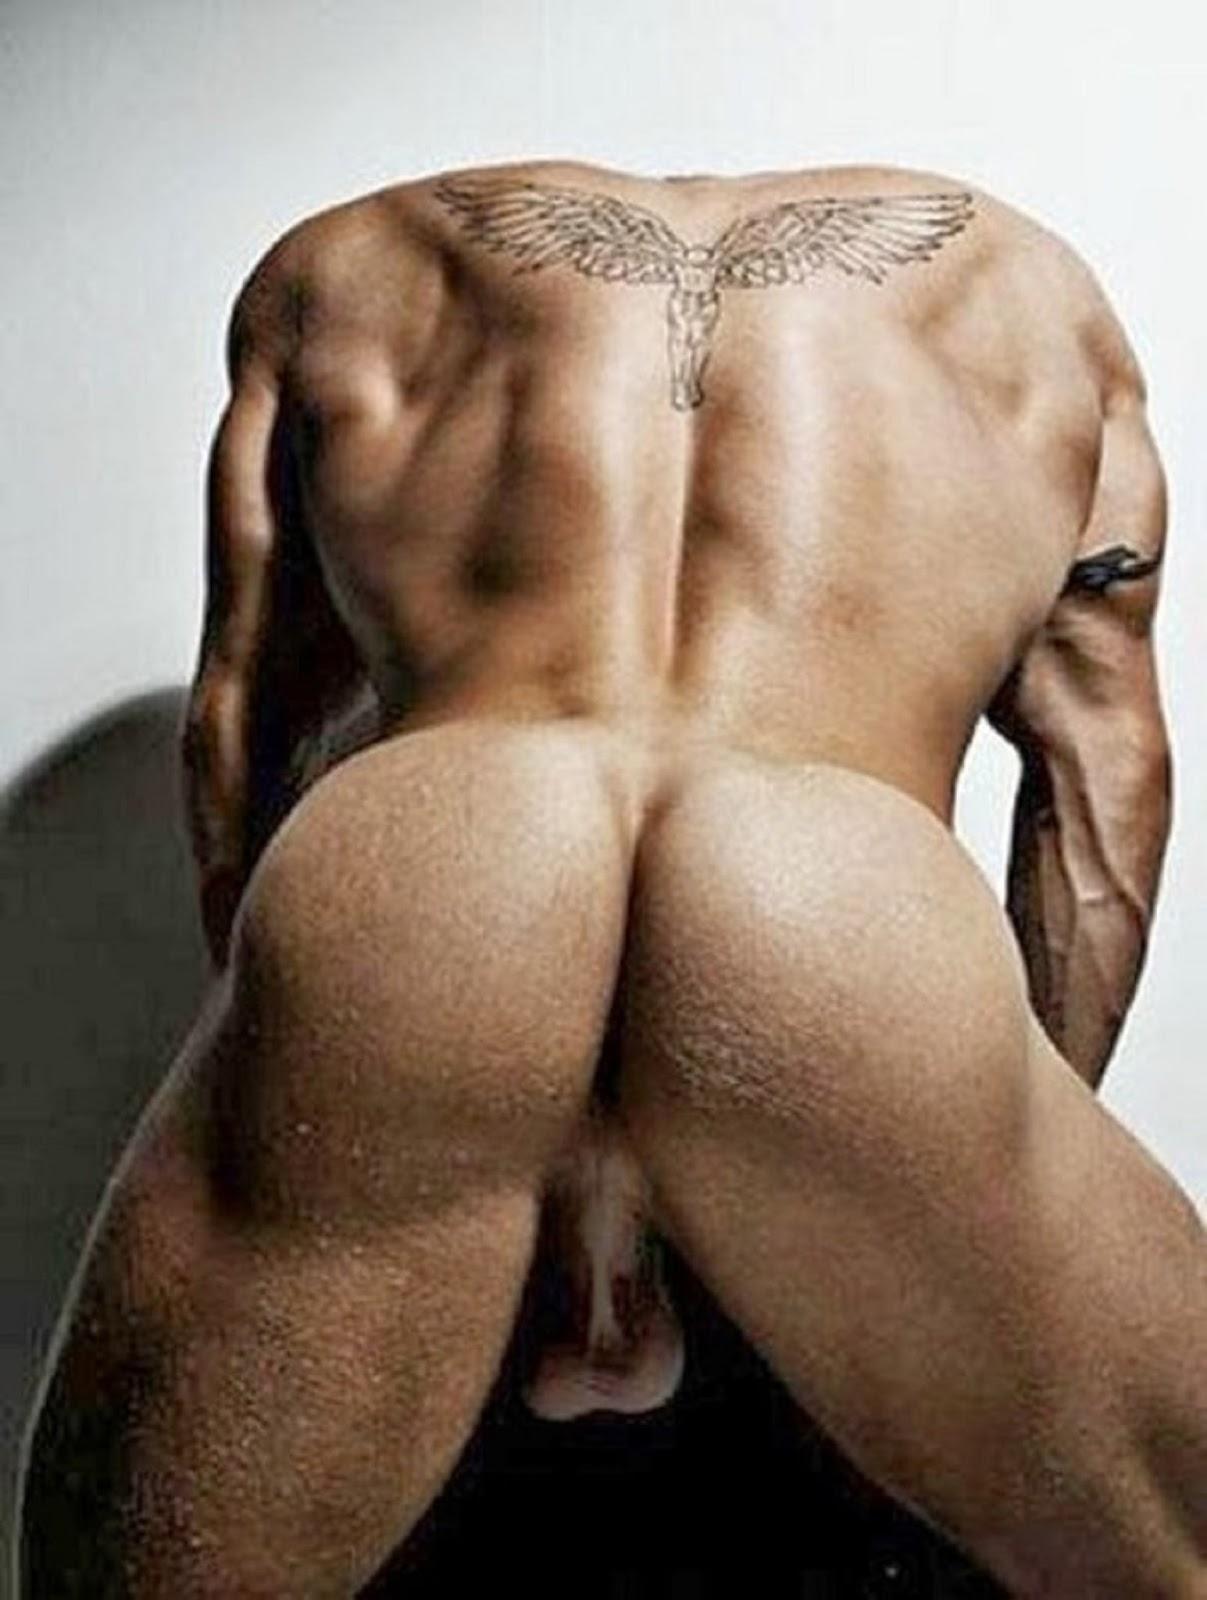 Gay ass men bubble butts pics and pics